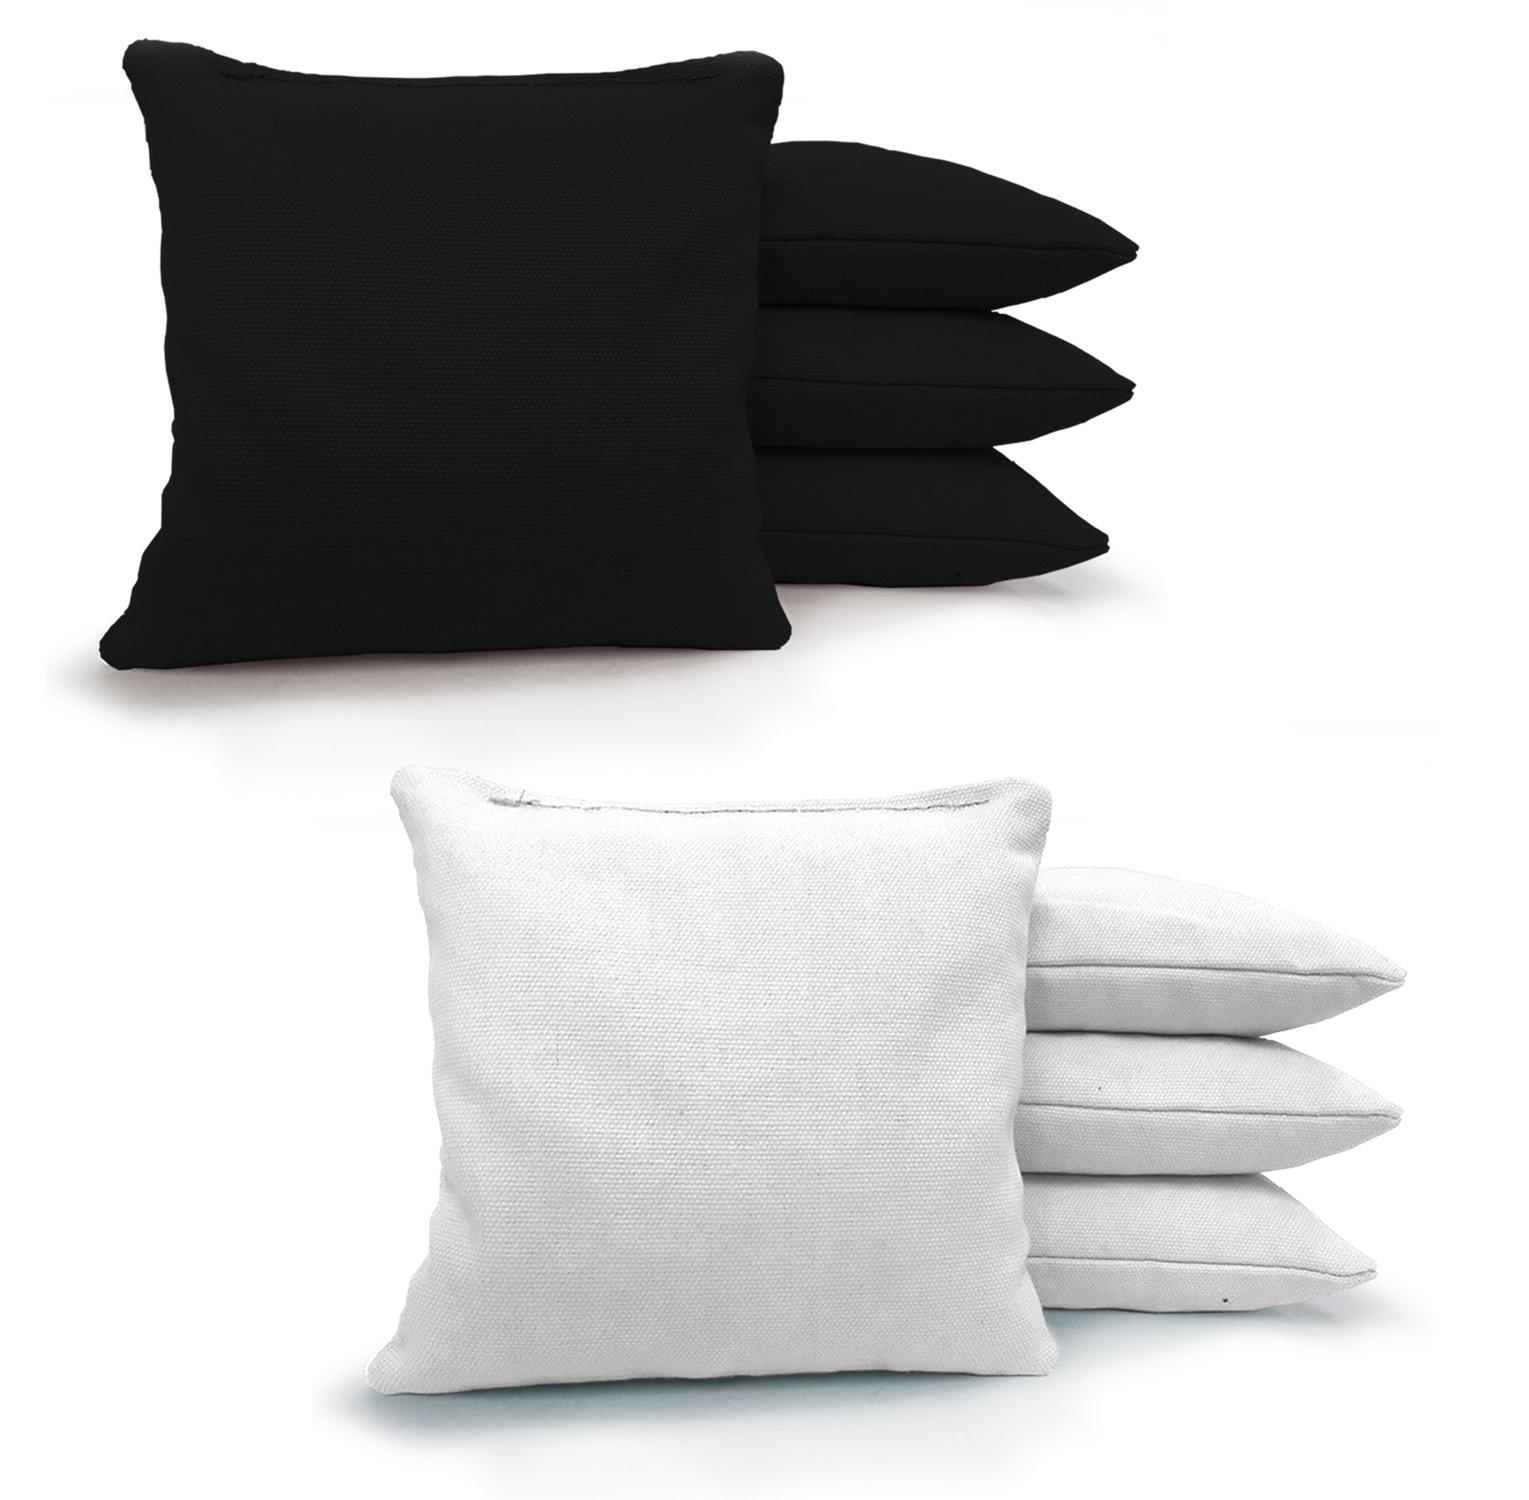 Johnson Enterprises, LLC 8 Standard Corn Filled Regulation Duck Cloth Cornhole Bags! 17 Colors (You Pick)!! (Black/White)